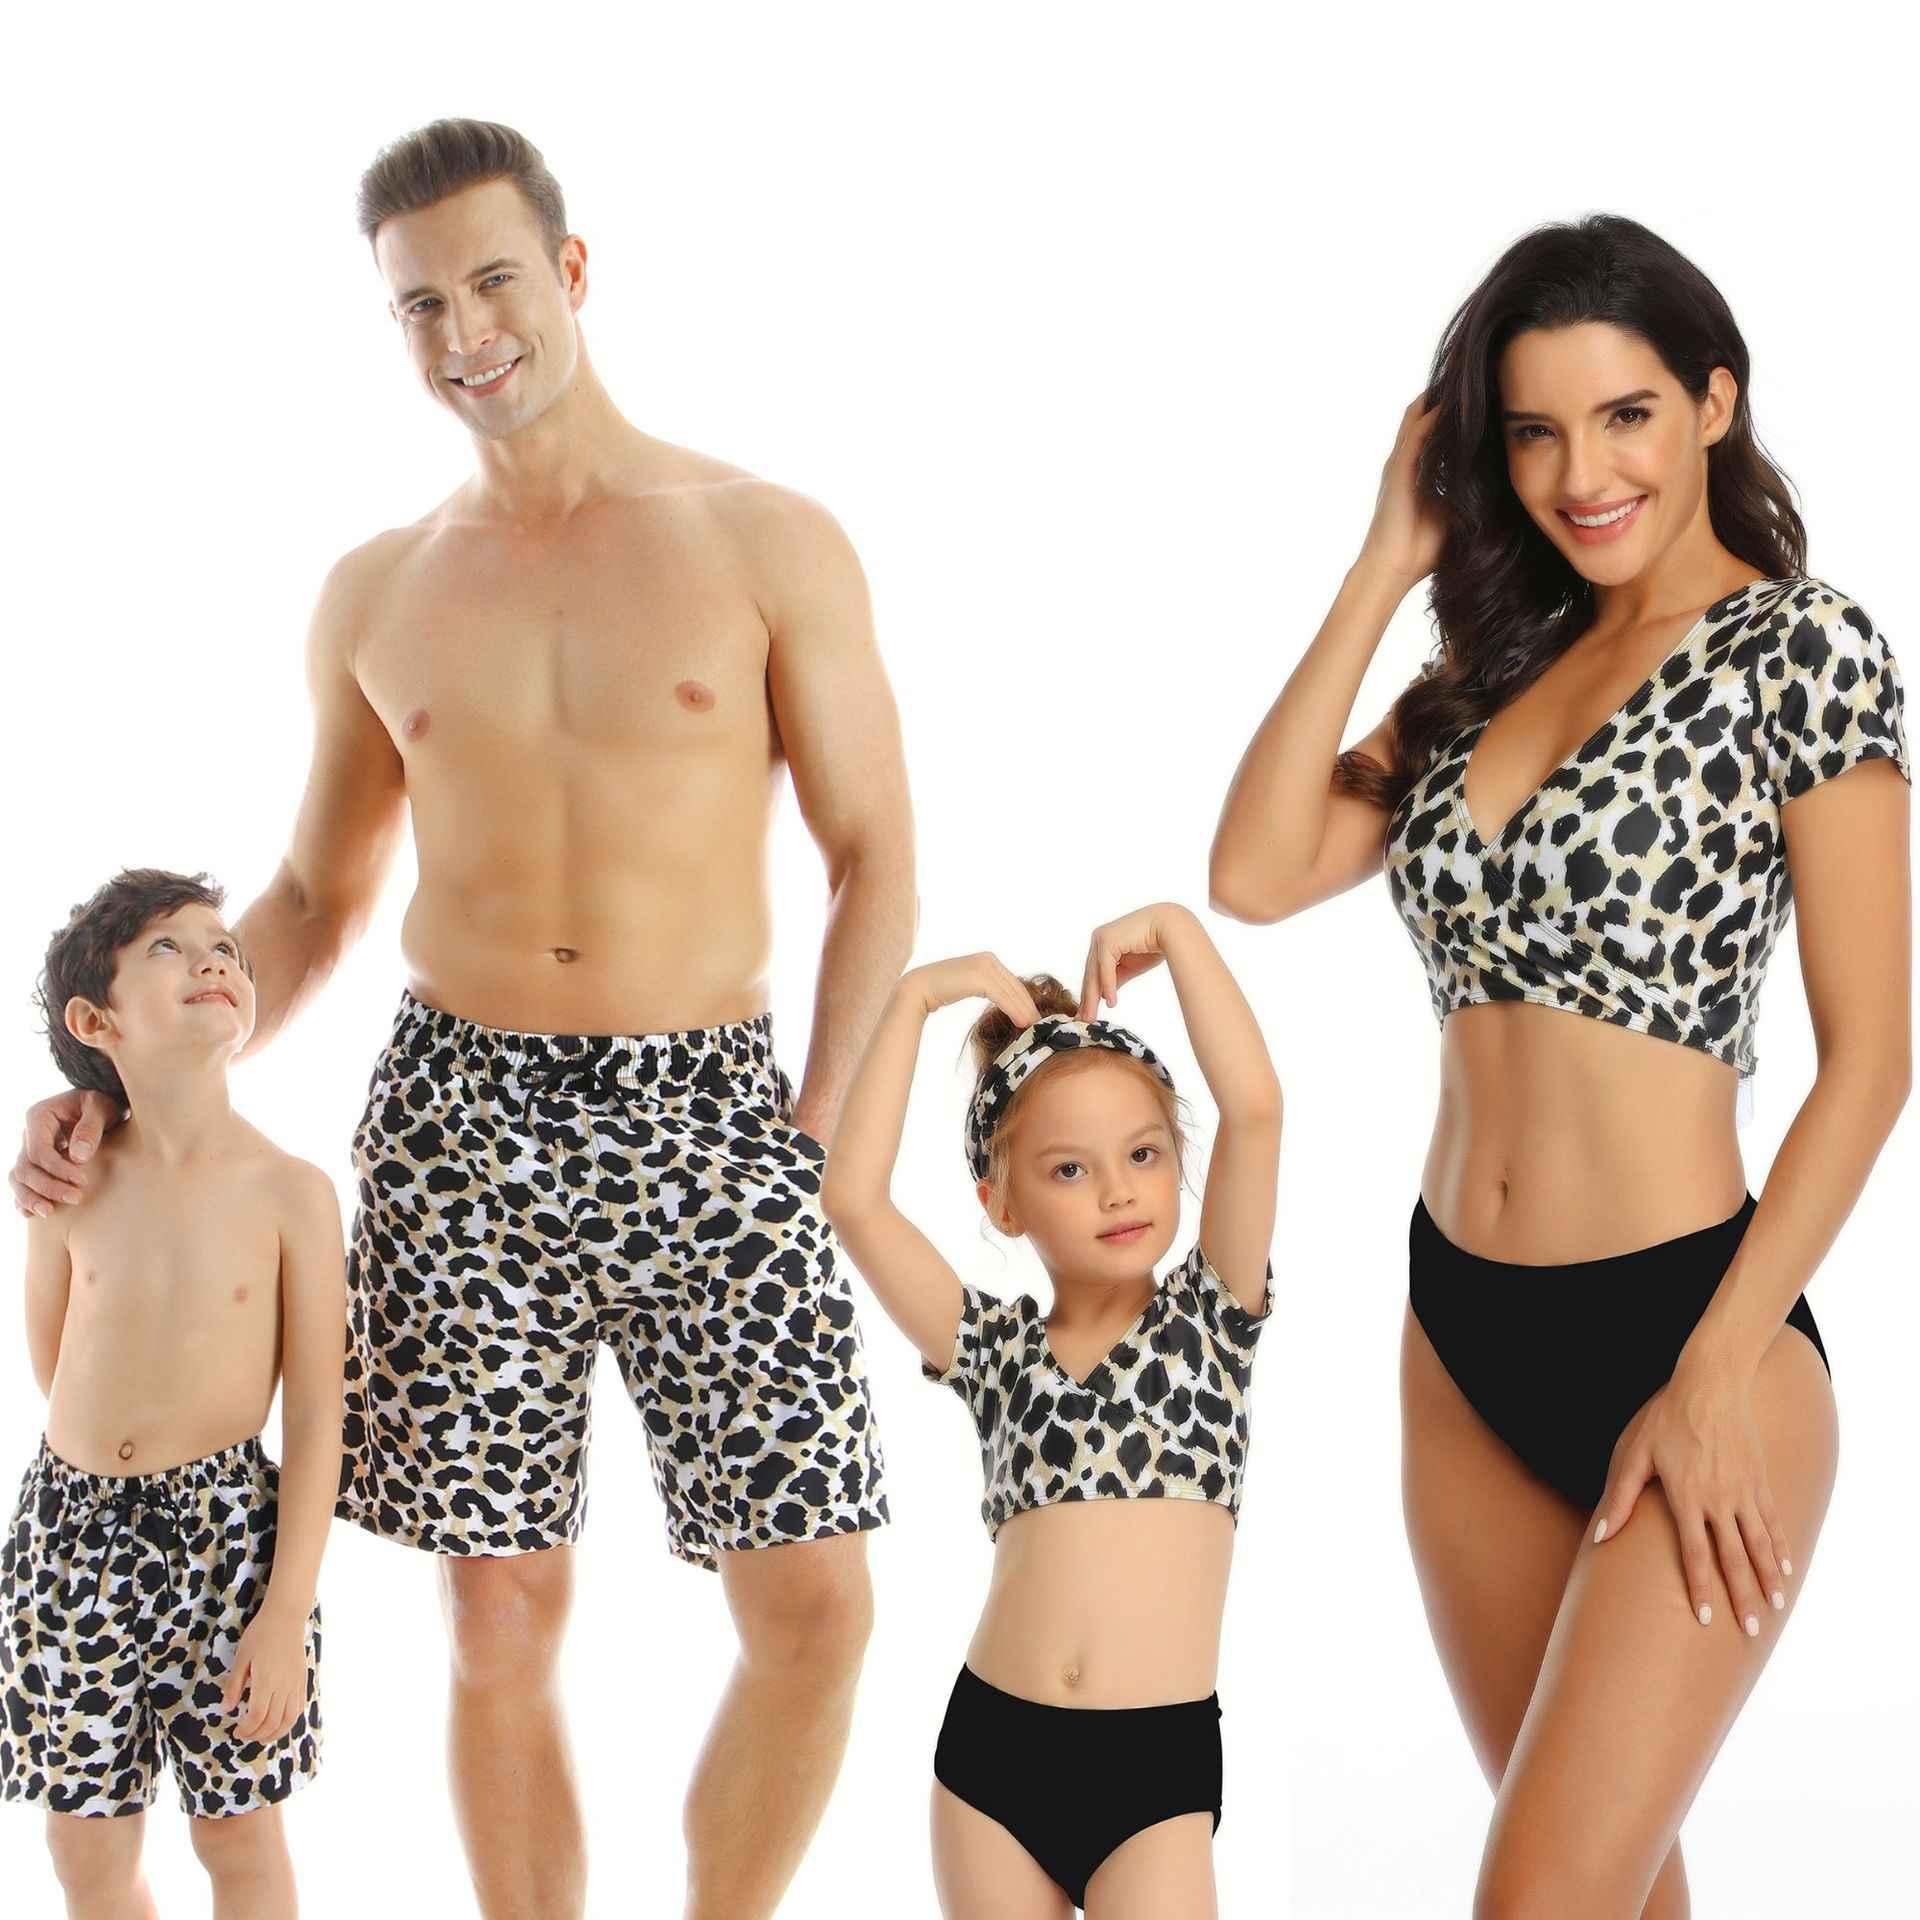 Familie Bijpassende Badmode Moeder Dochter Taseel Blad Blauwe Bikini Papa Zoon Badpak Vrouwen Mannen Koppels Outfits Meisjes Jongens Badpak